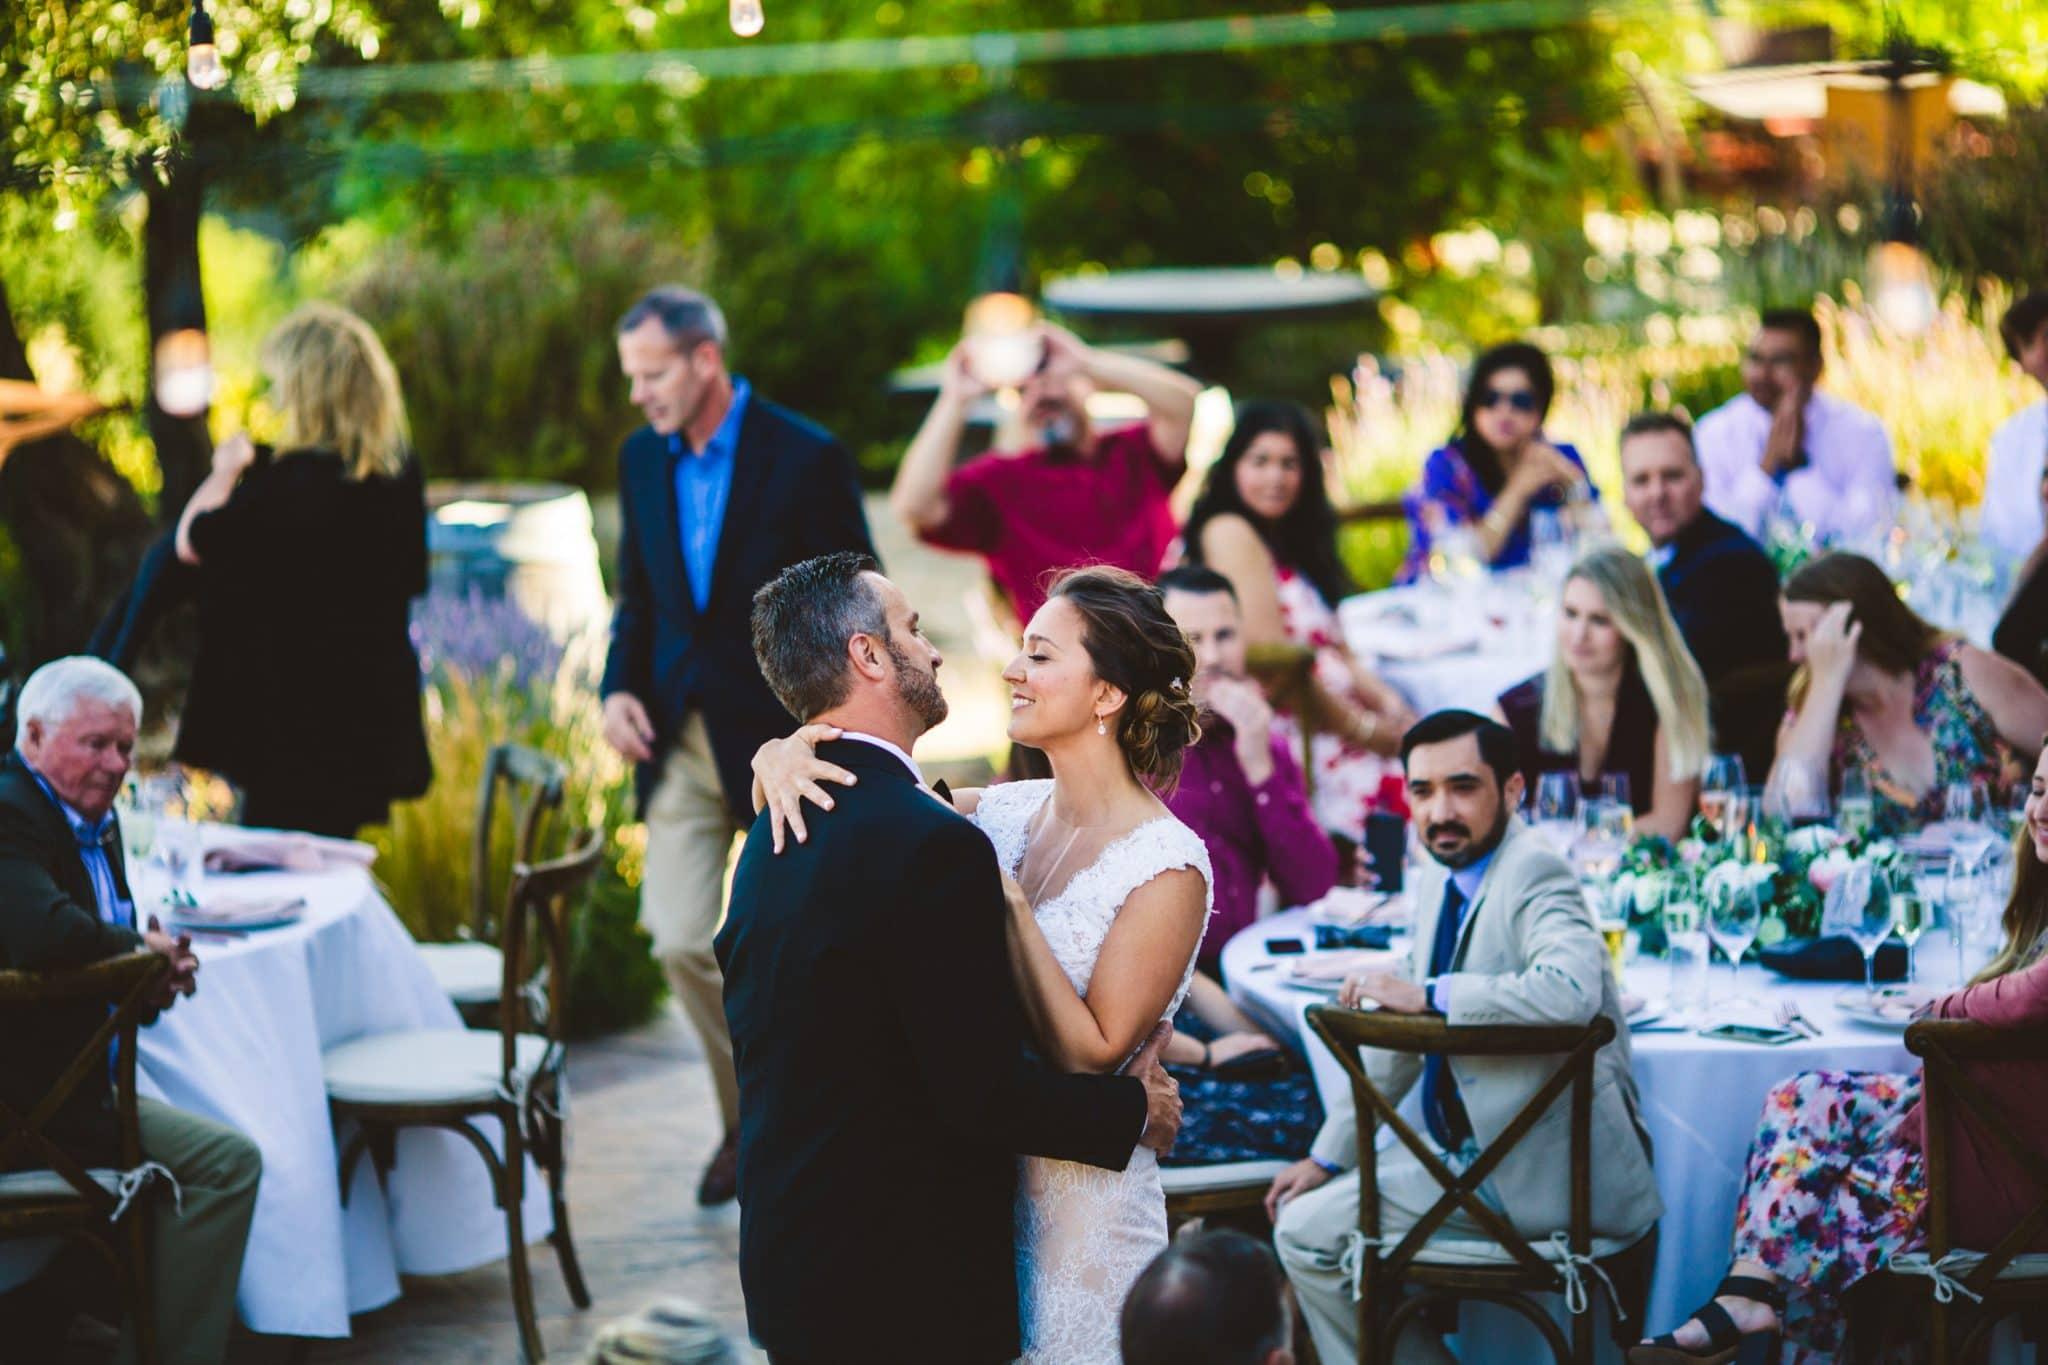 Croad Vineyard Wedding first dance